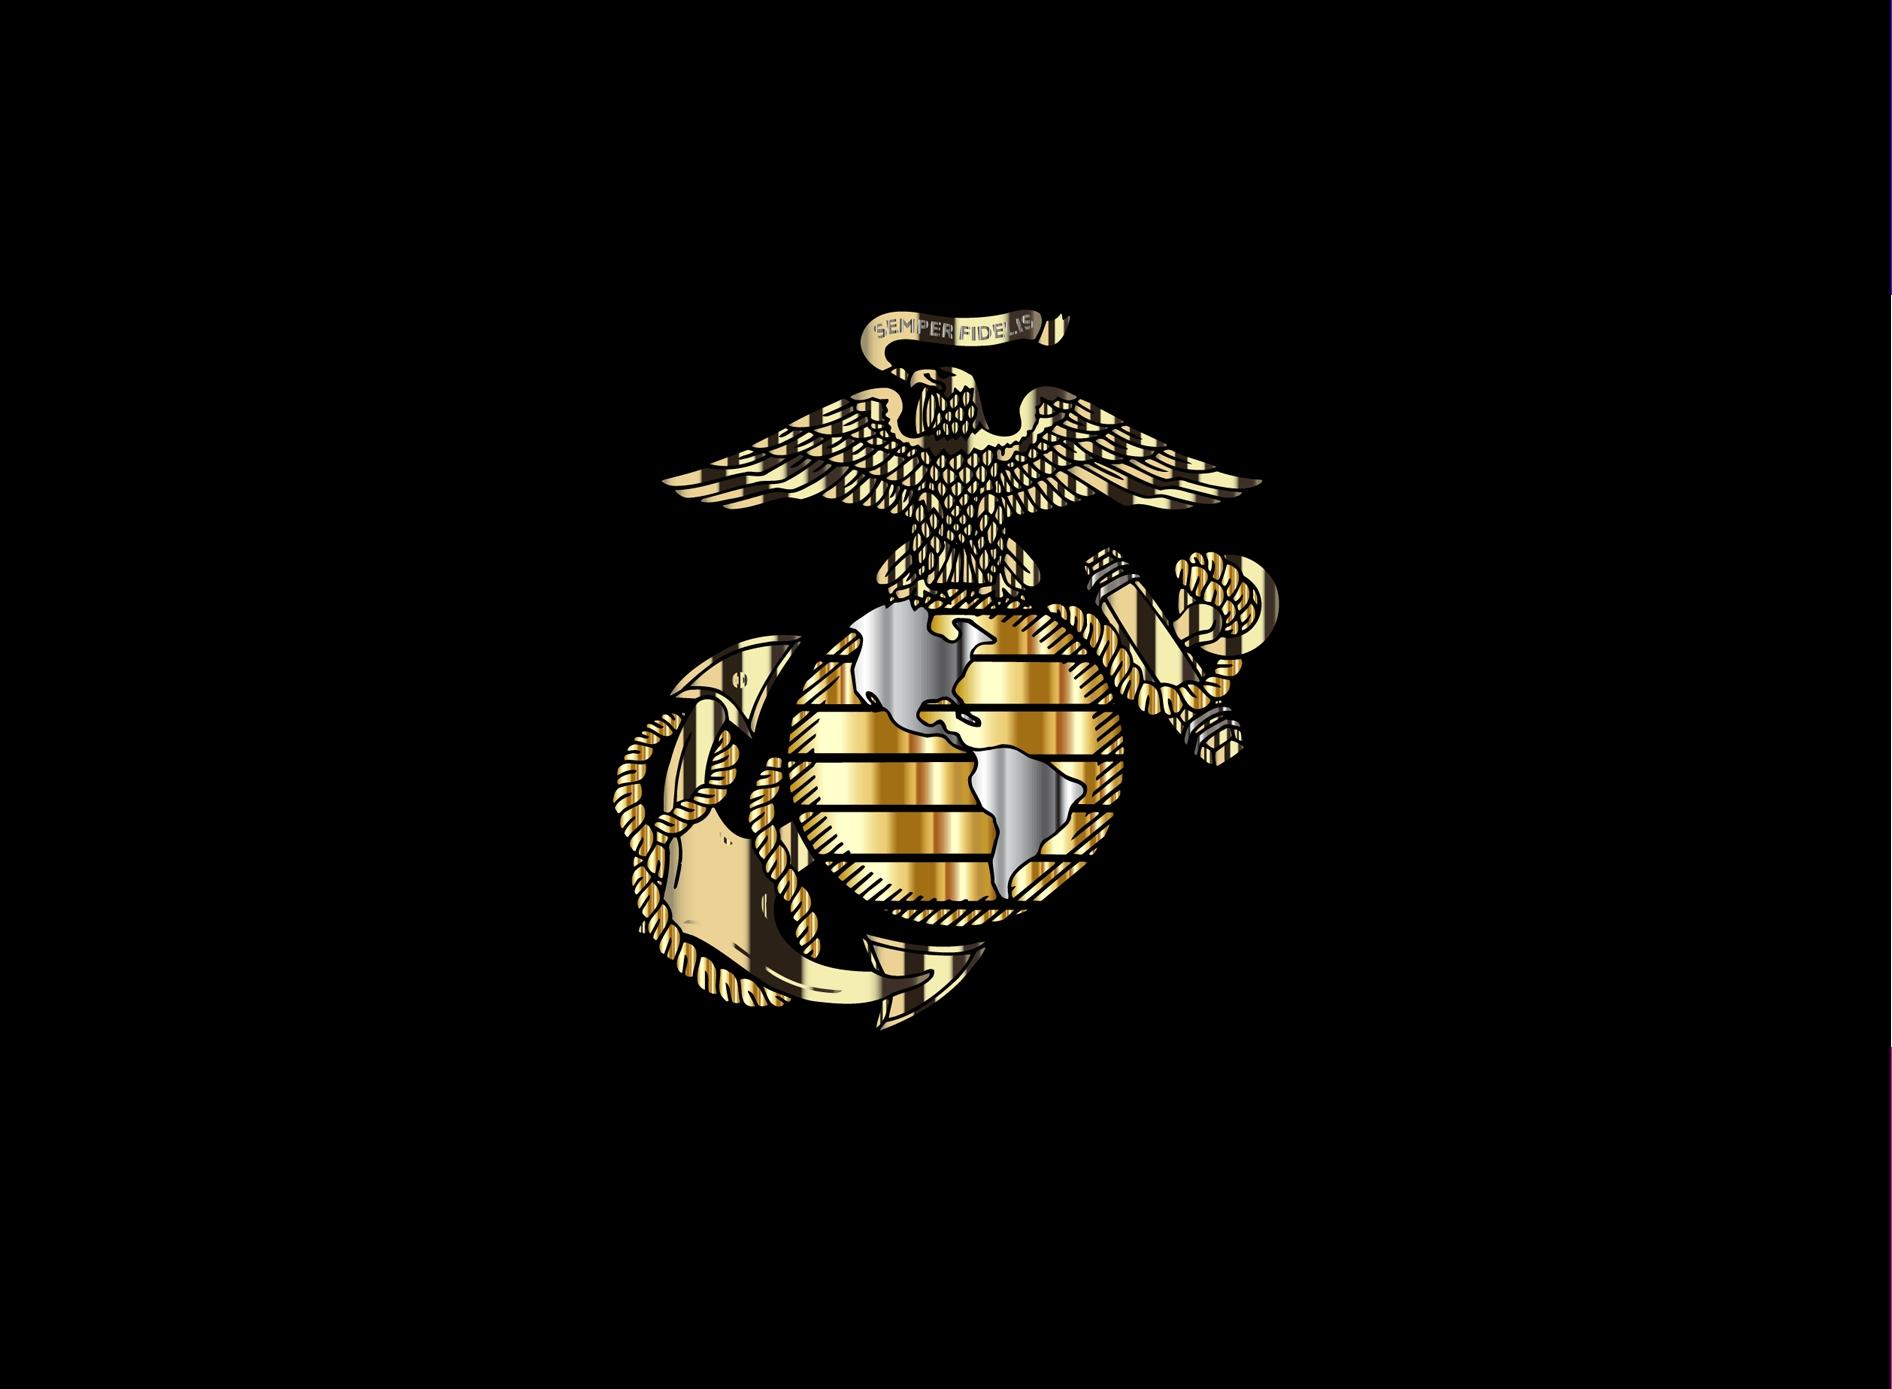 10 Latest Marine Corps Logo Wallpaper FULL HD 1080p For PC Desktop